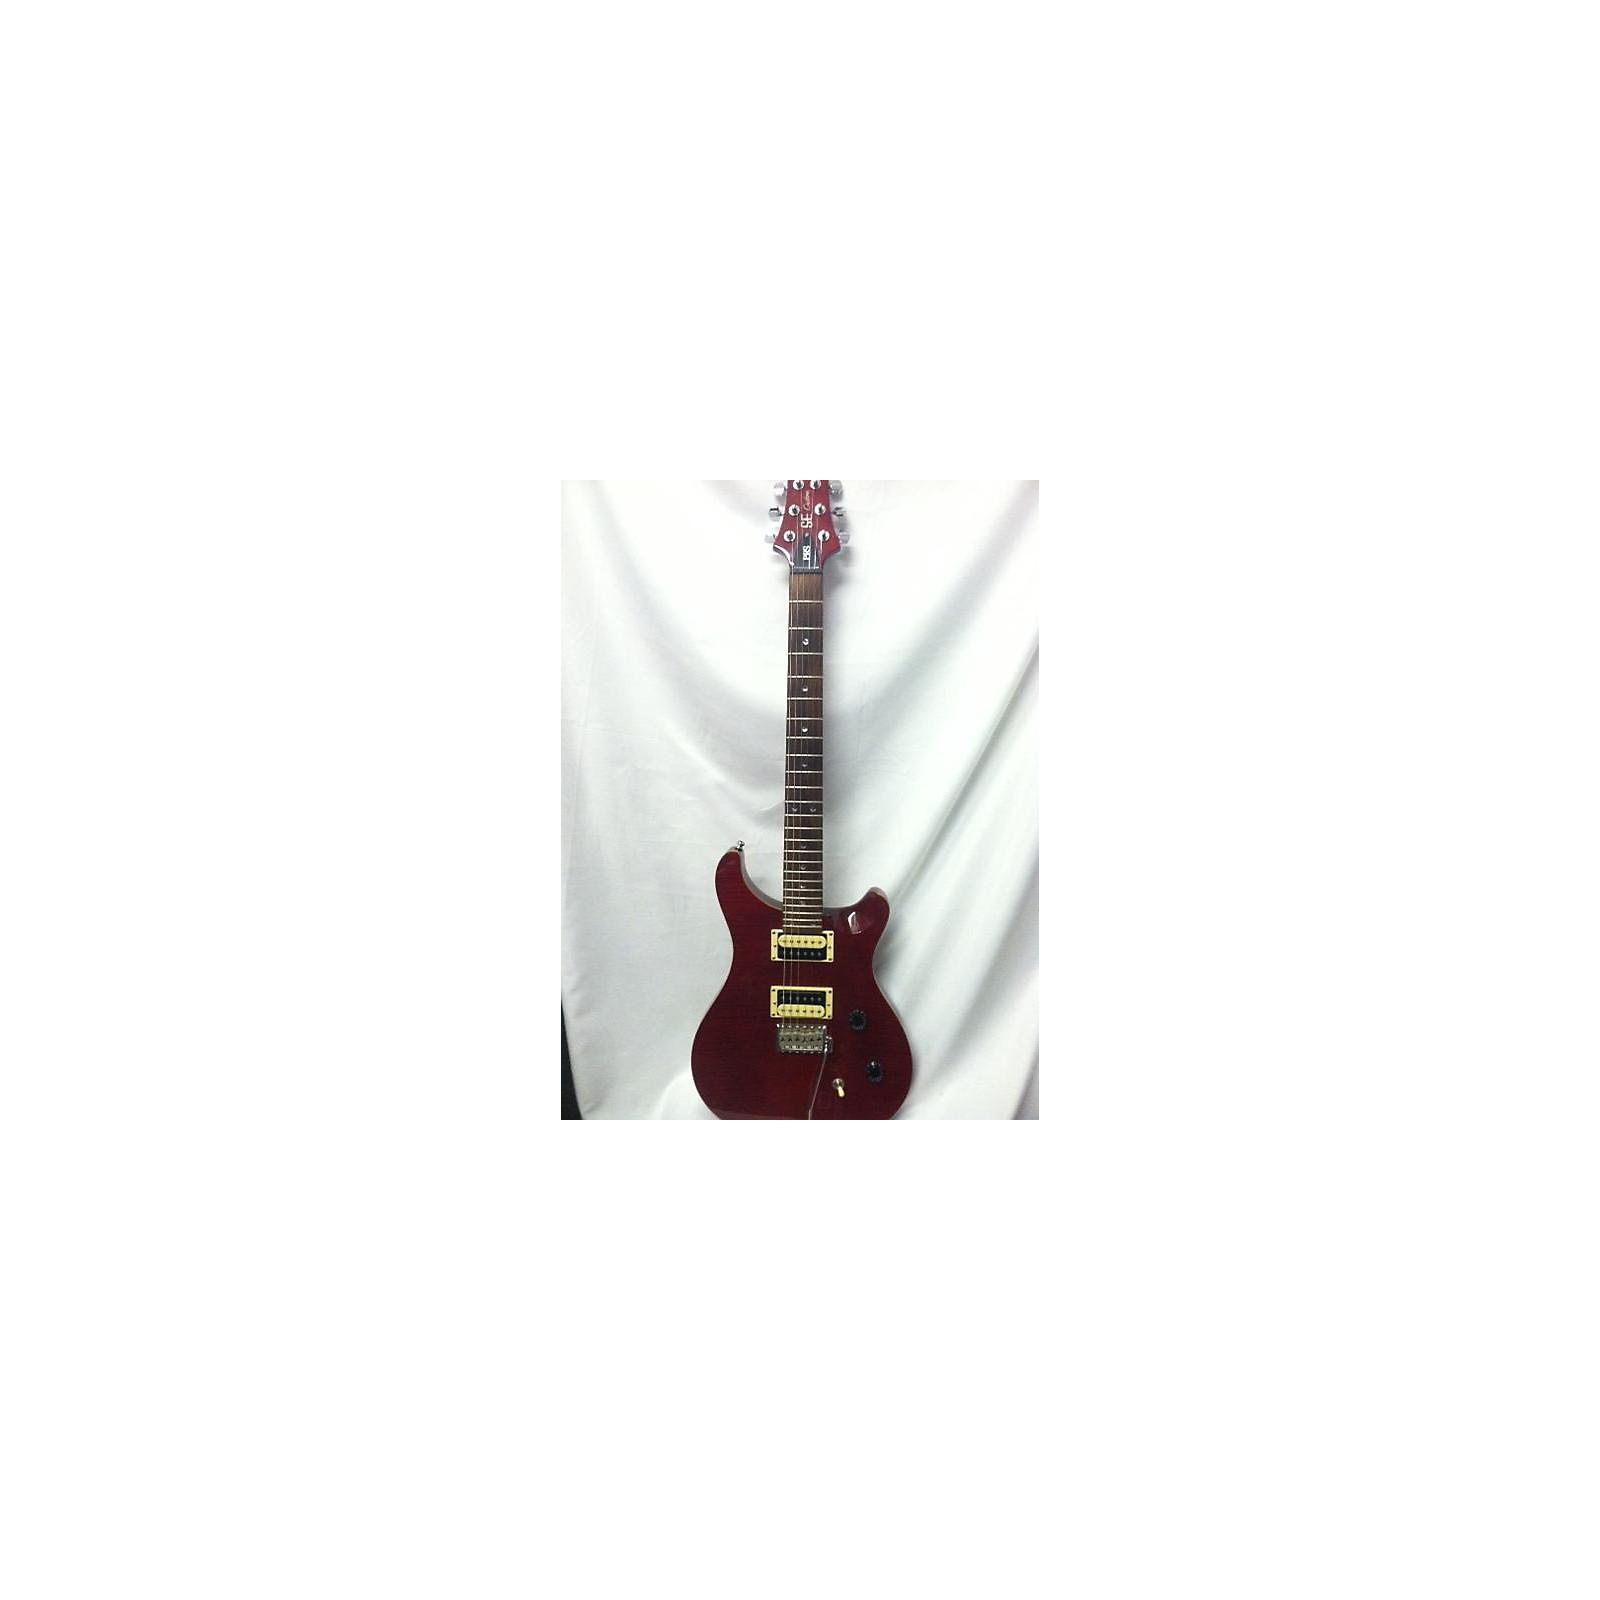 PRS 2010 CM4 SE Custom 24 Solid Body Electric Guitar